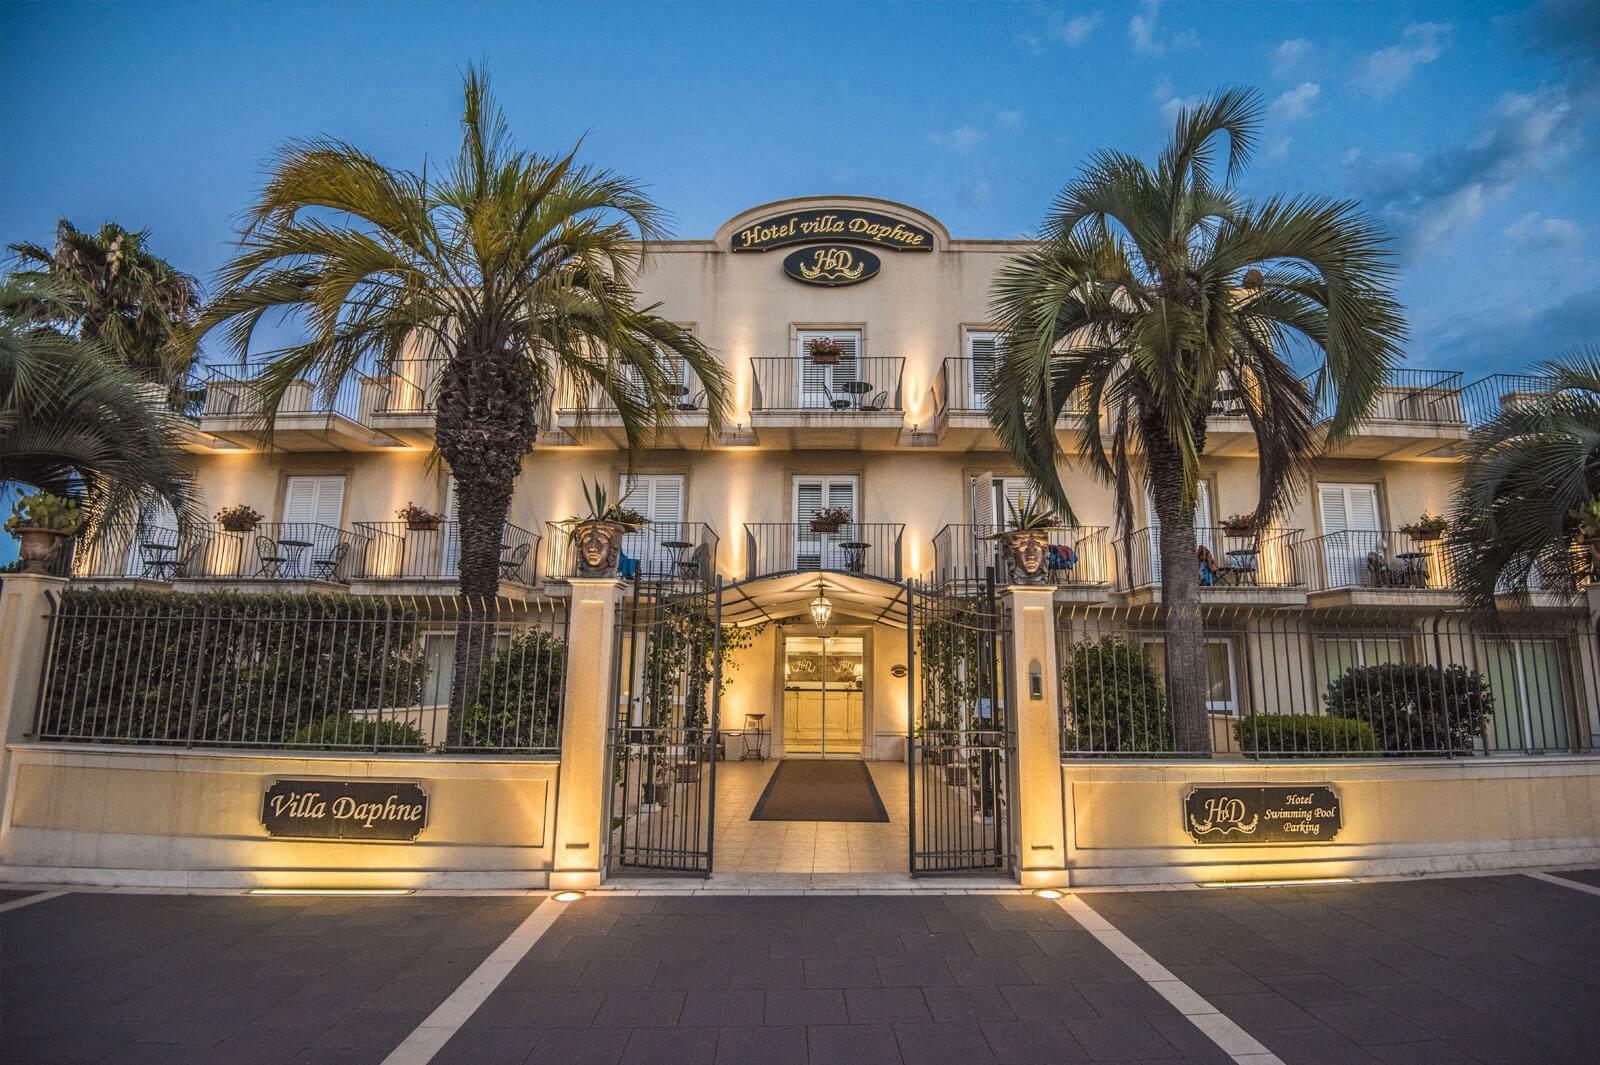 Hotel villa daphne beachfront hotel sicily hotel villa daphne official site giardini naxos - Hotel 3 stelle giardini naxos ...